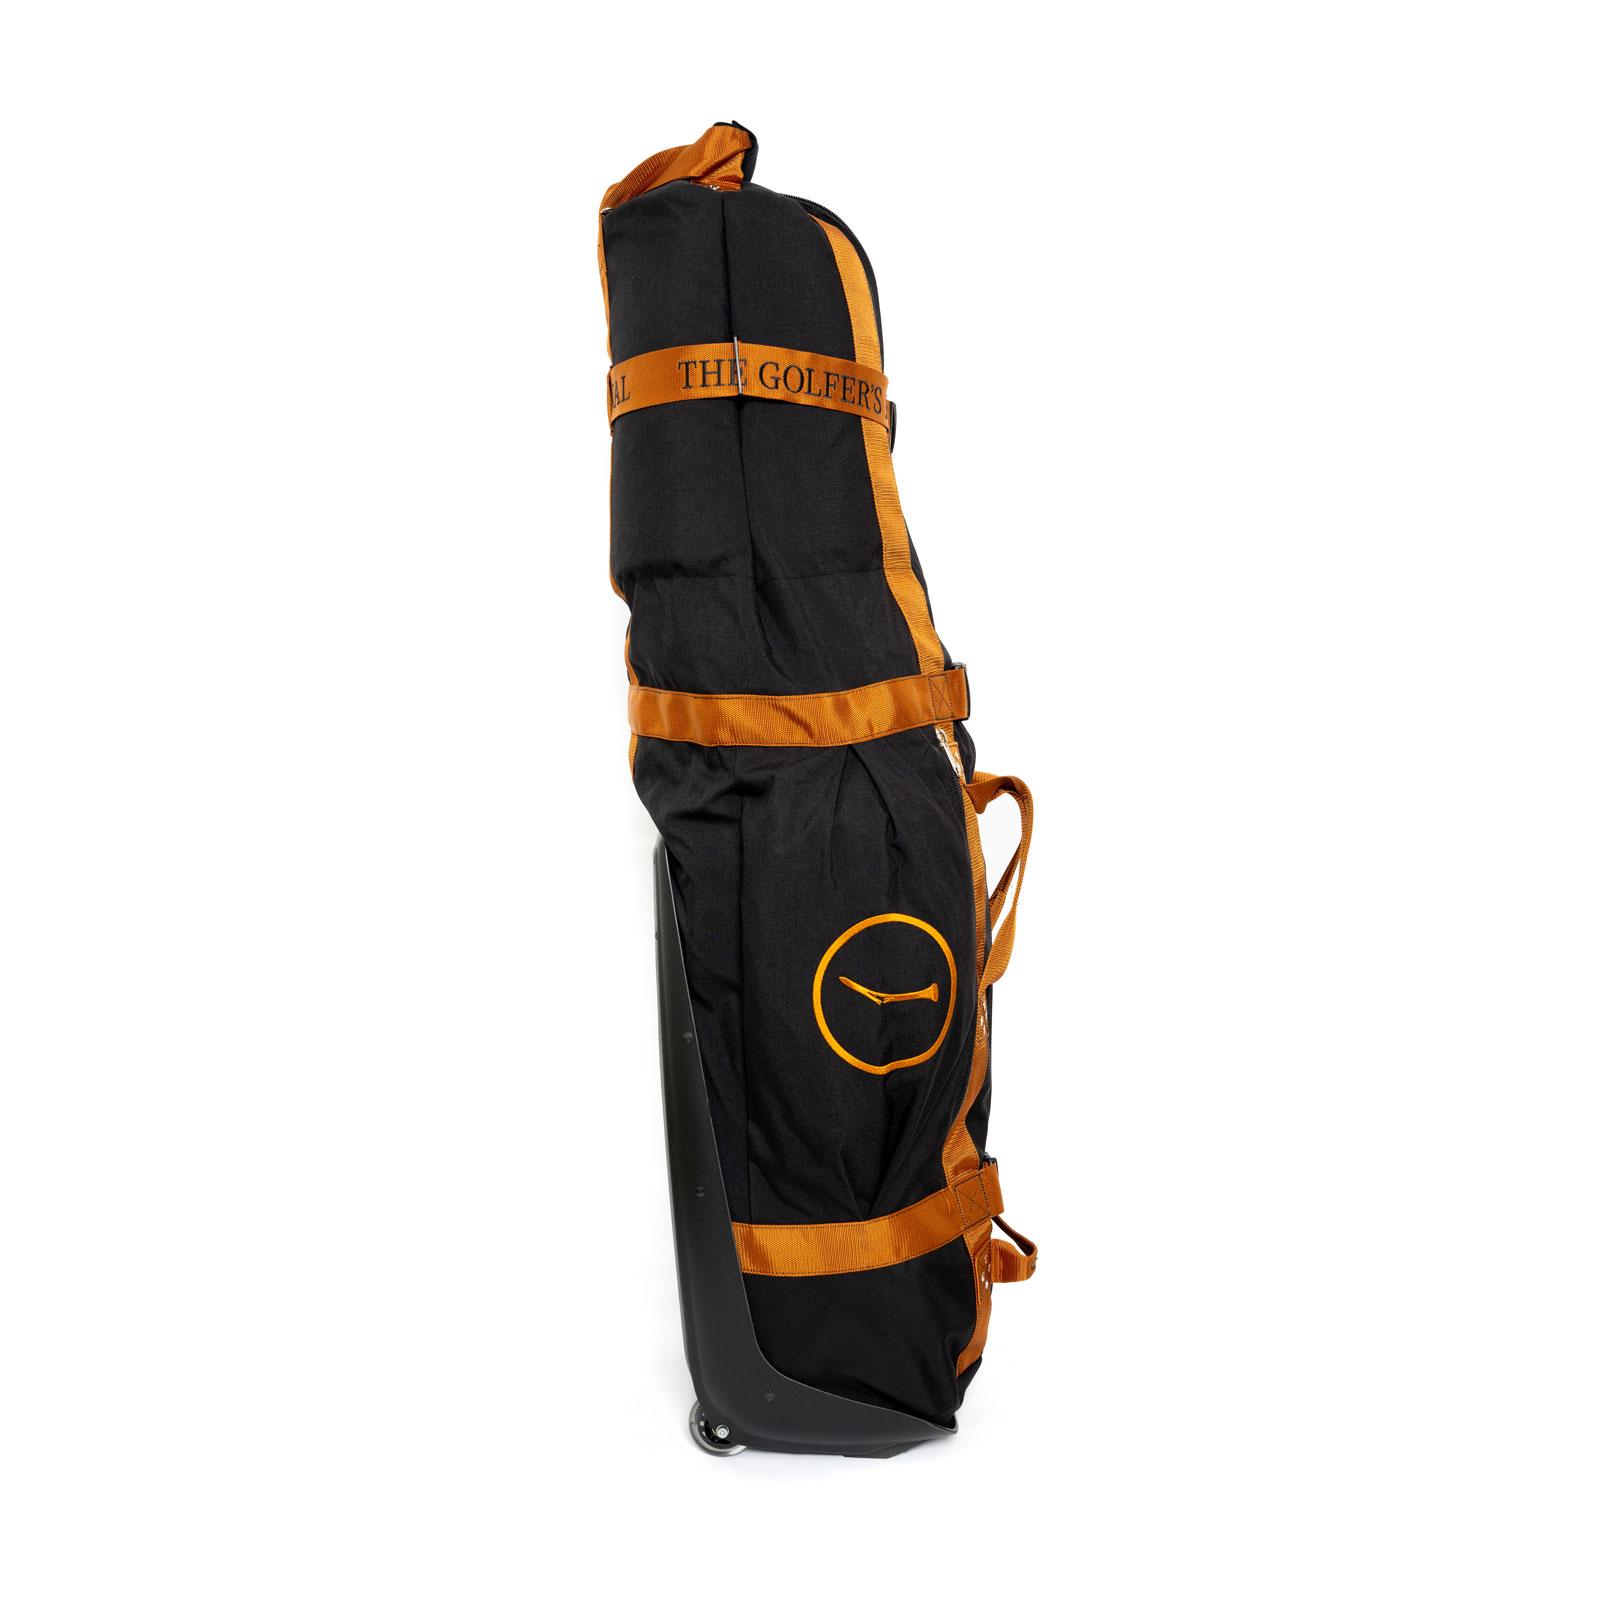 The Wanderer Travel Bag